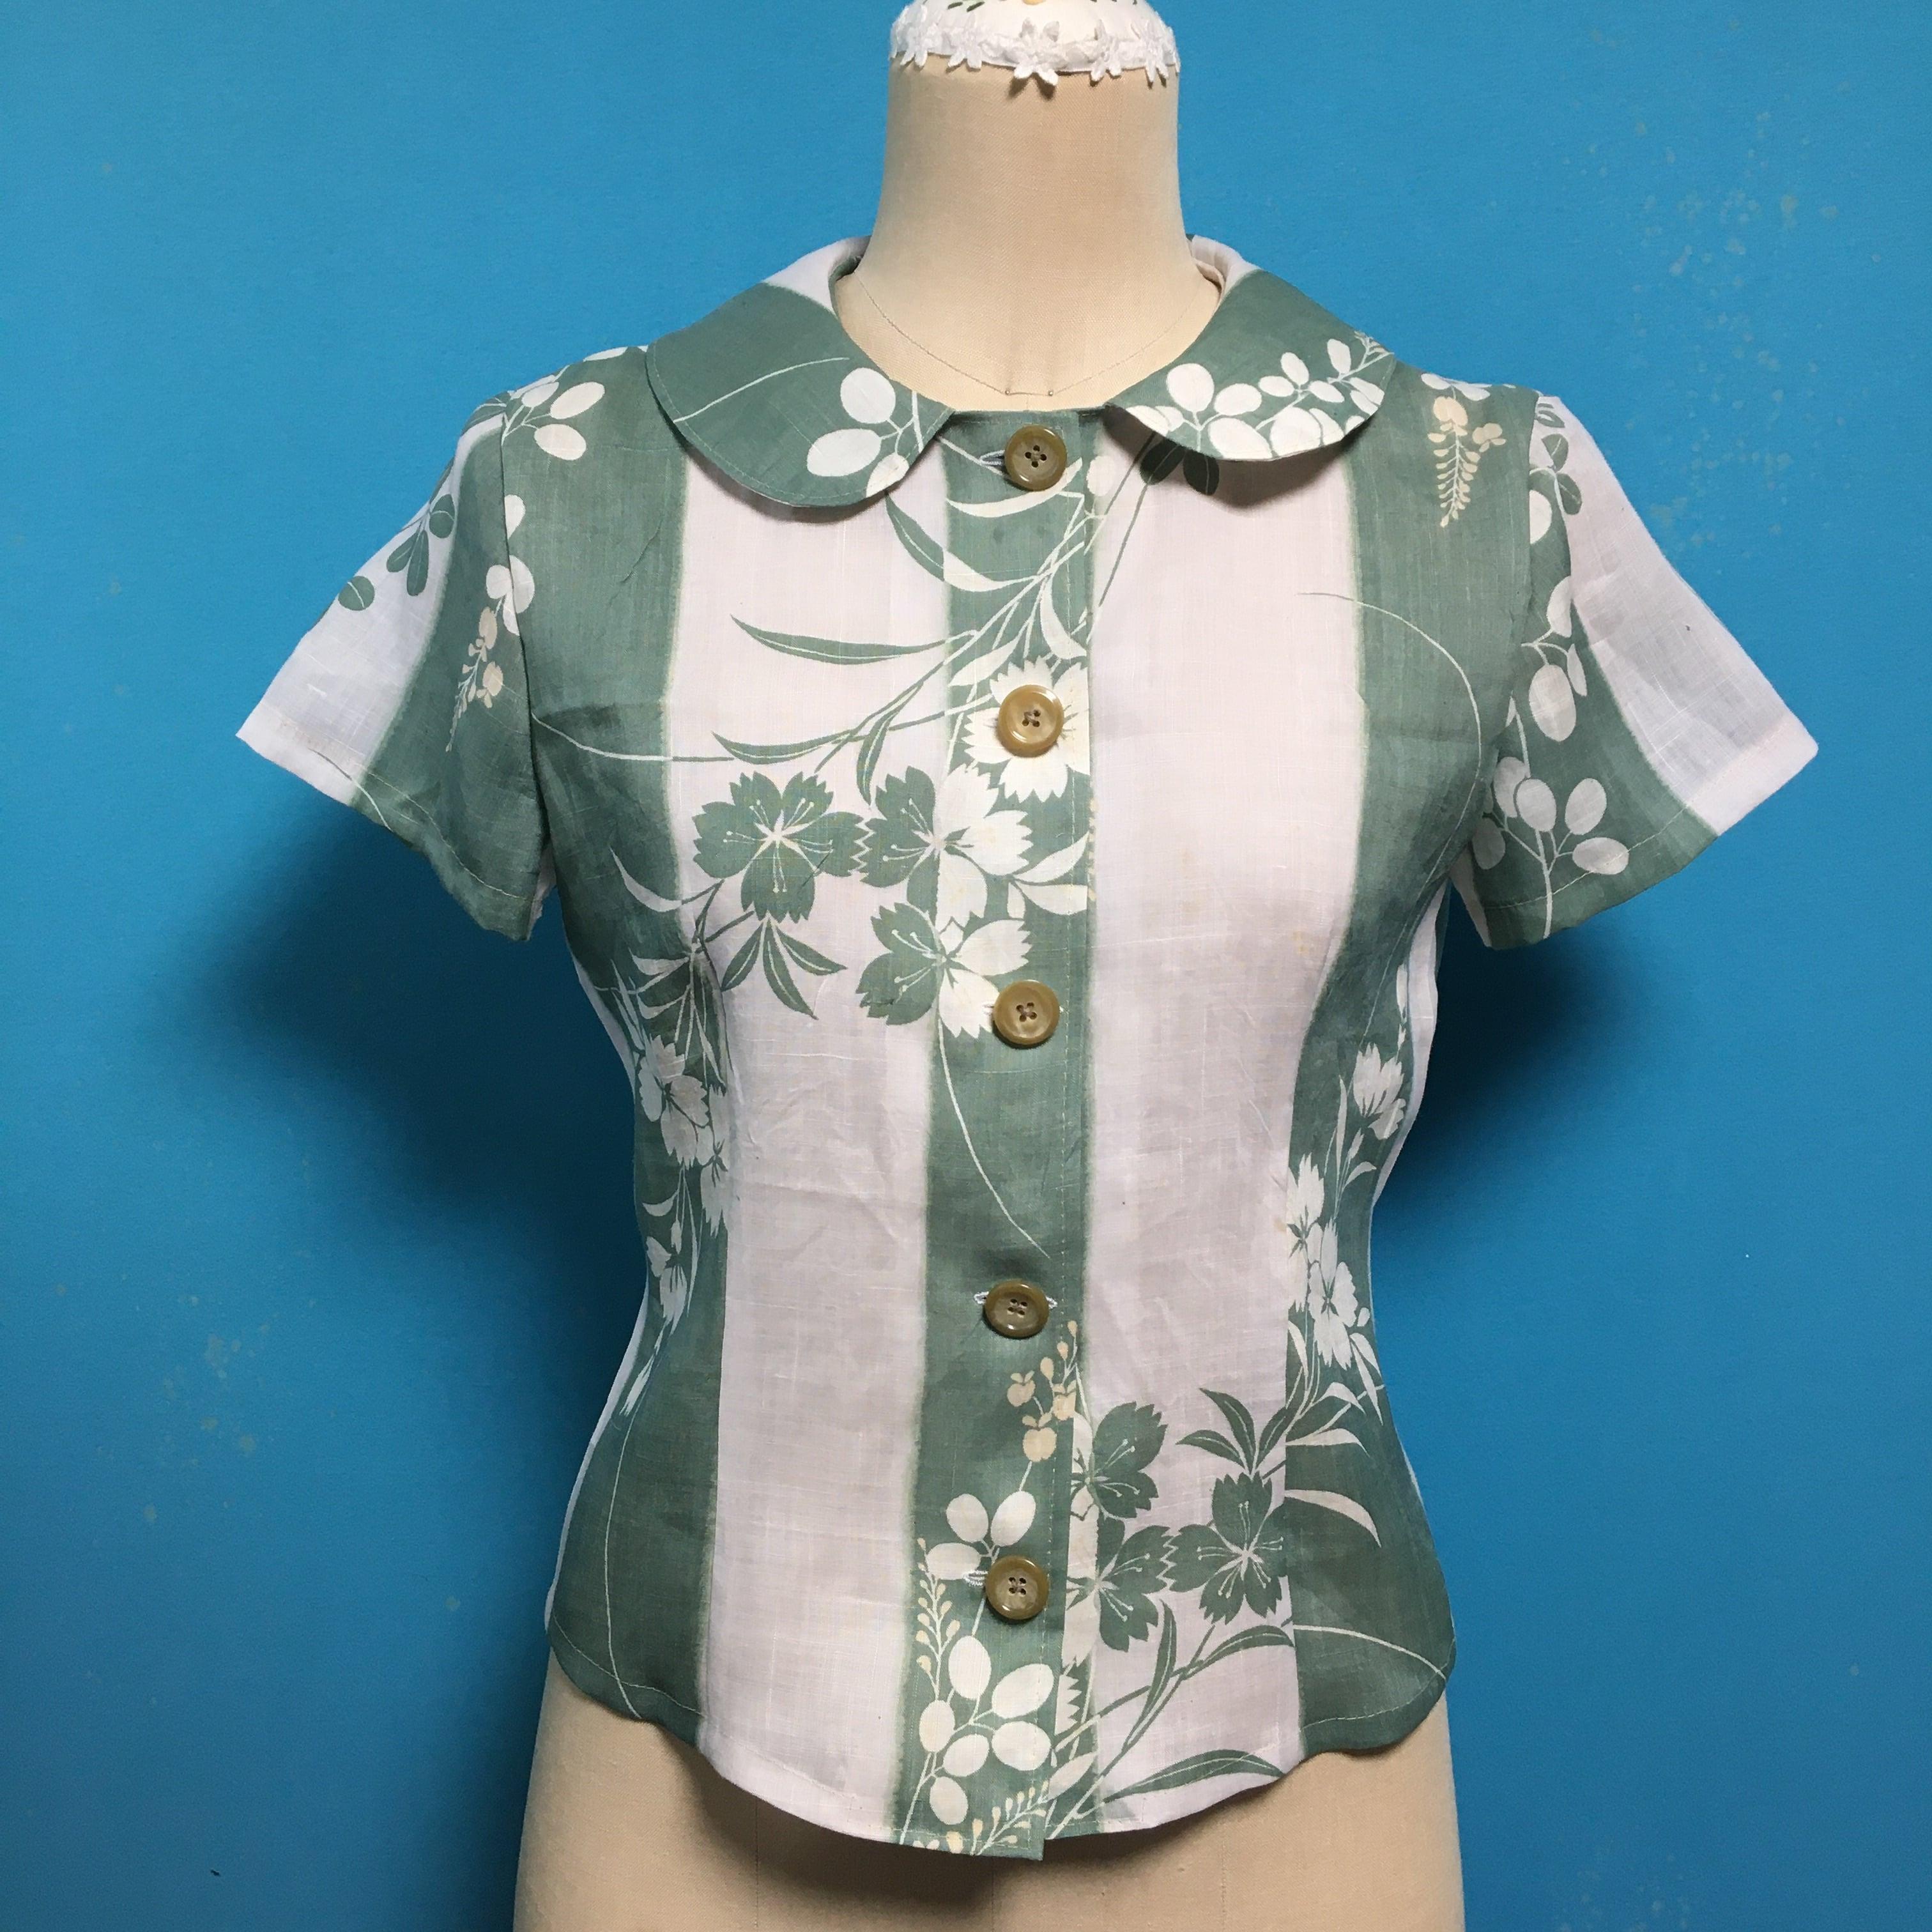 Vintage 麻の着物 丸襟ブラウス